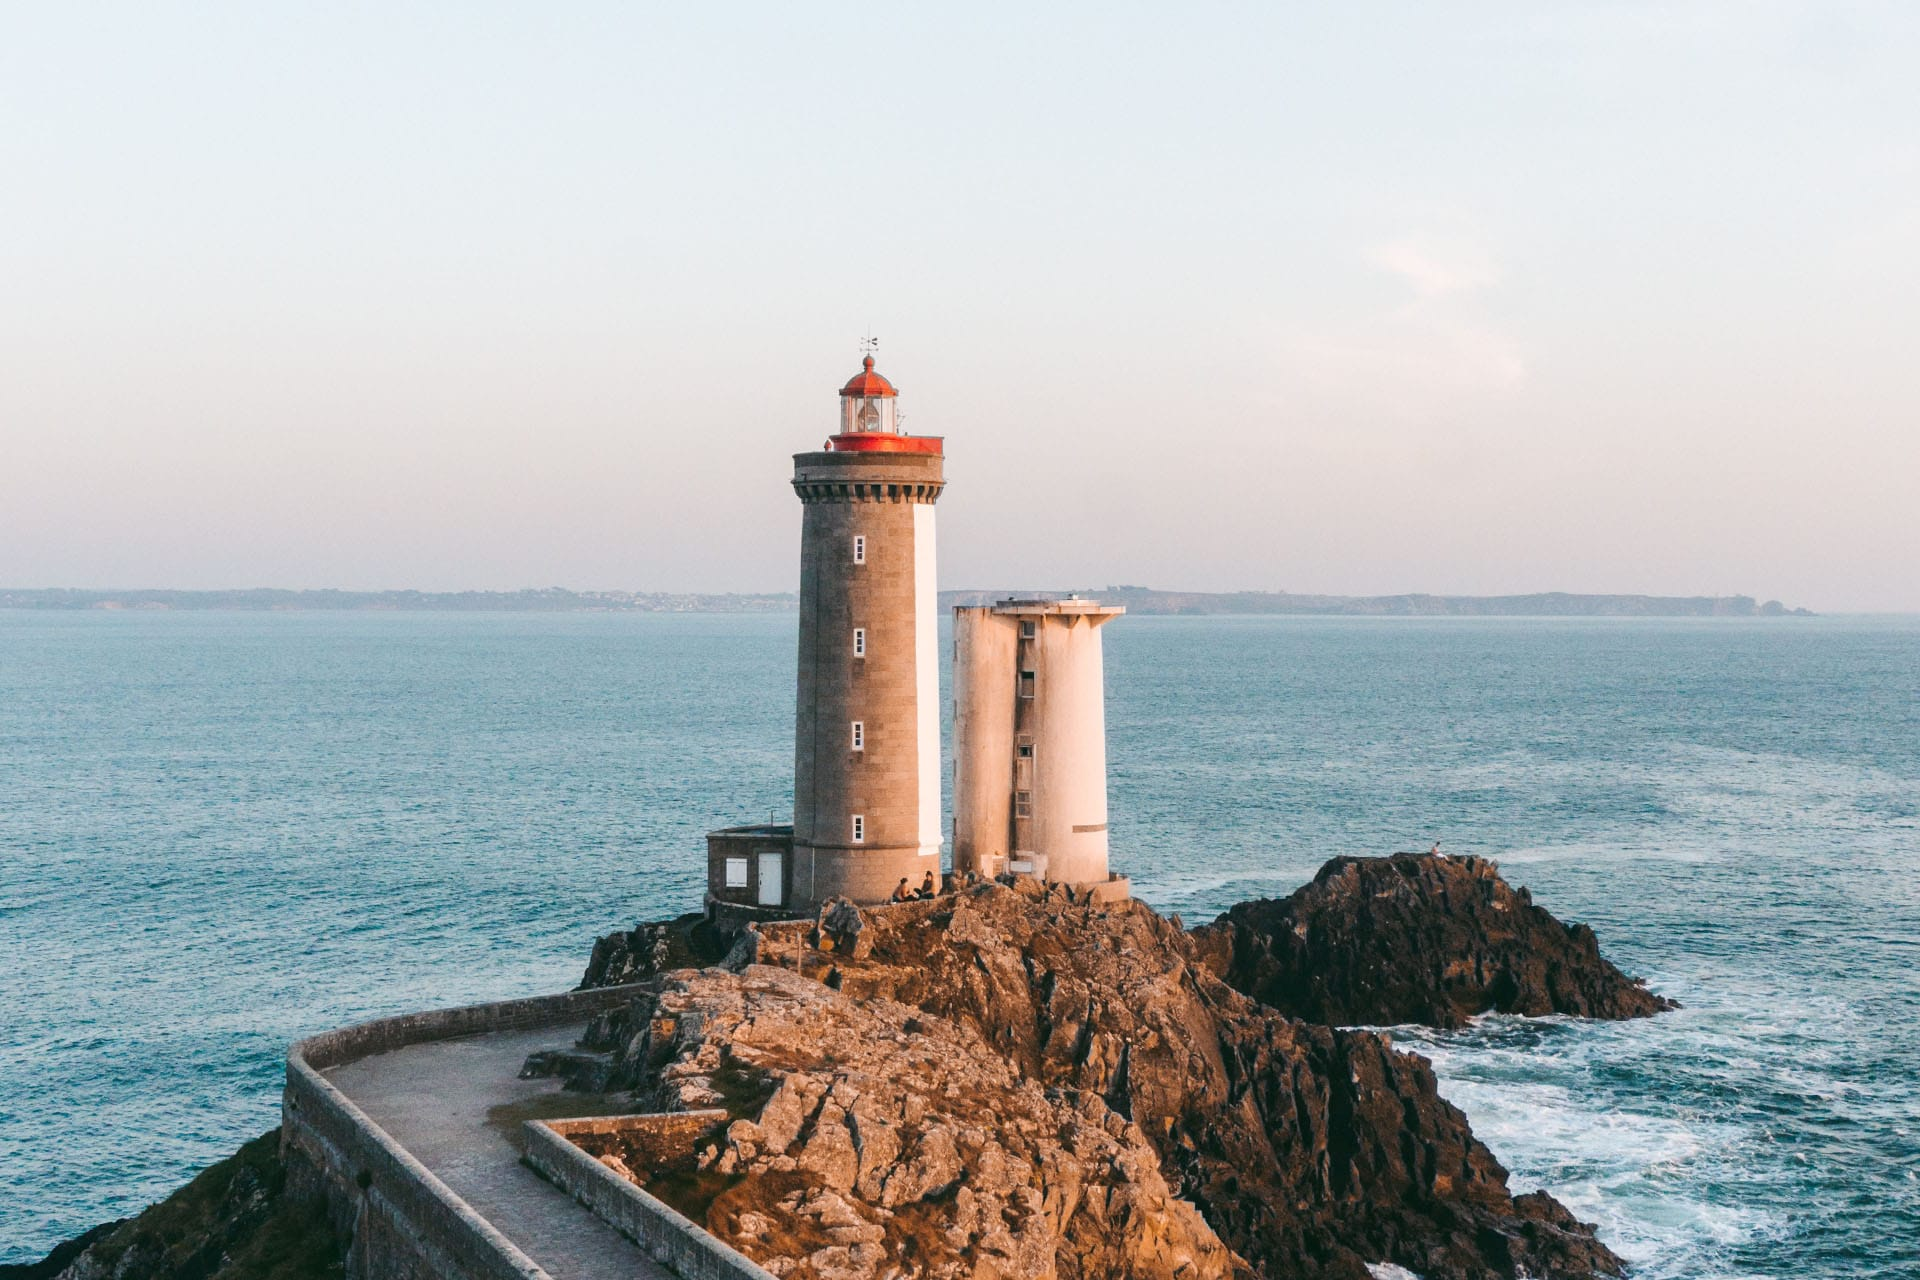 France Brest Lighthouse